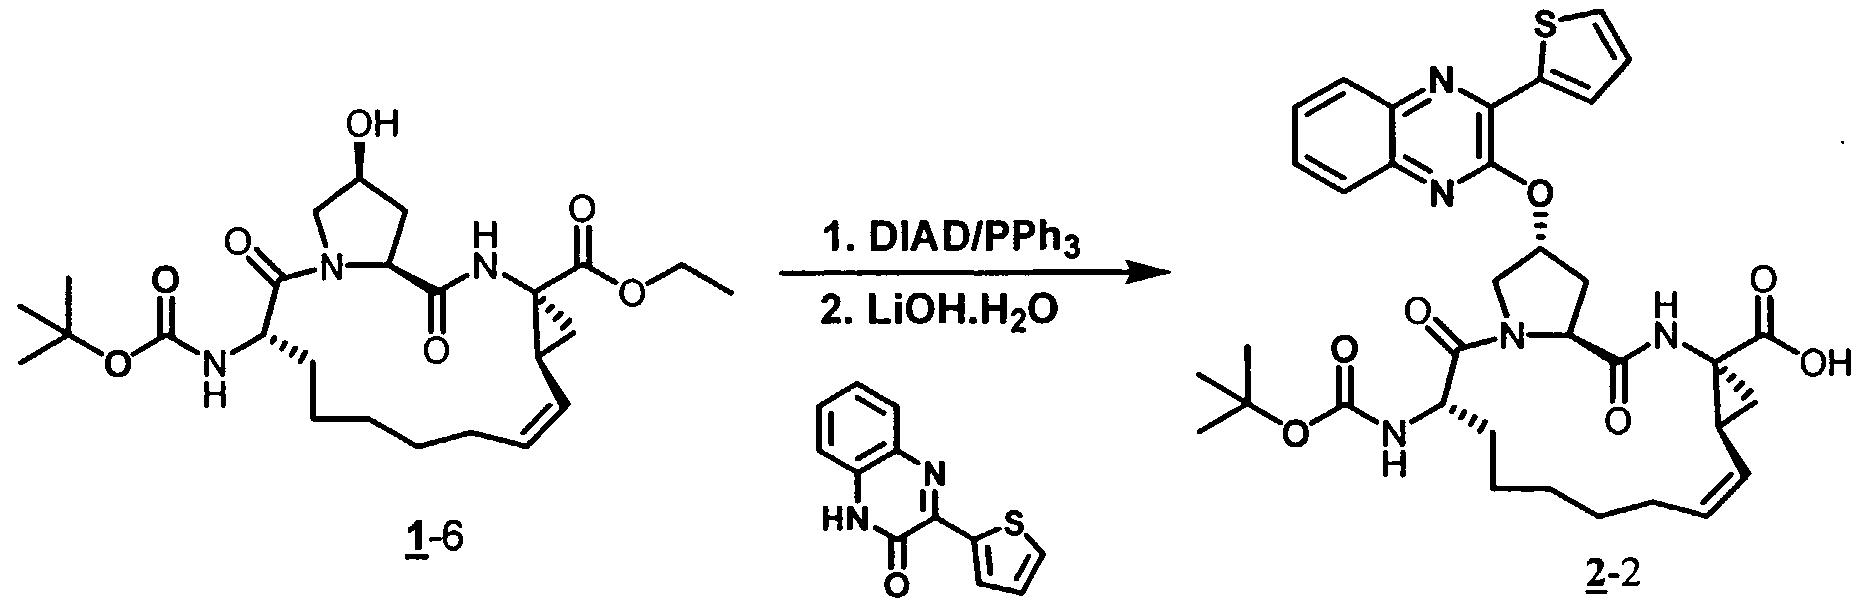 Synthesis of spiro-cyclics via ring-closing metathesis